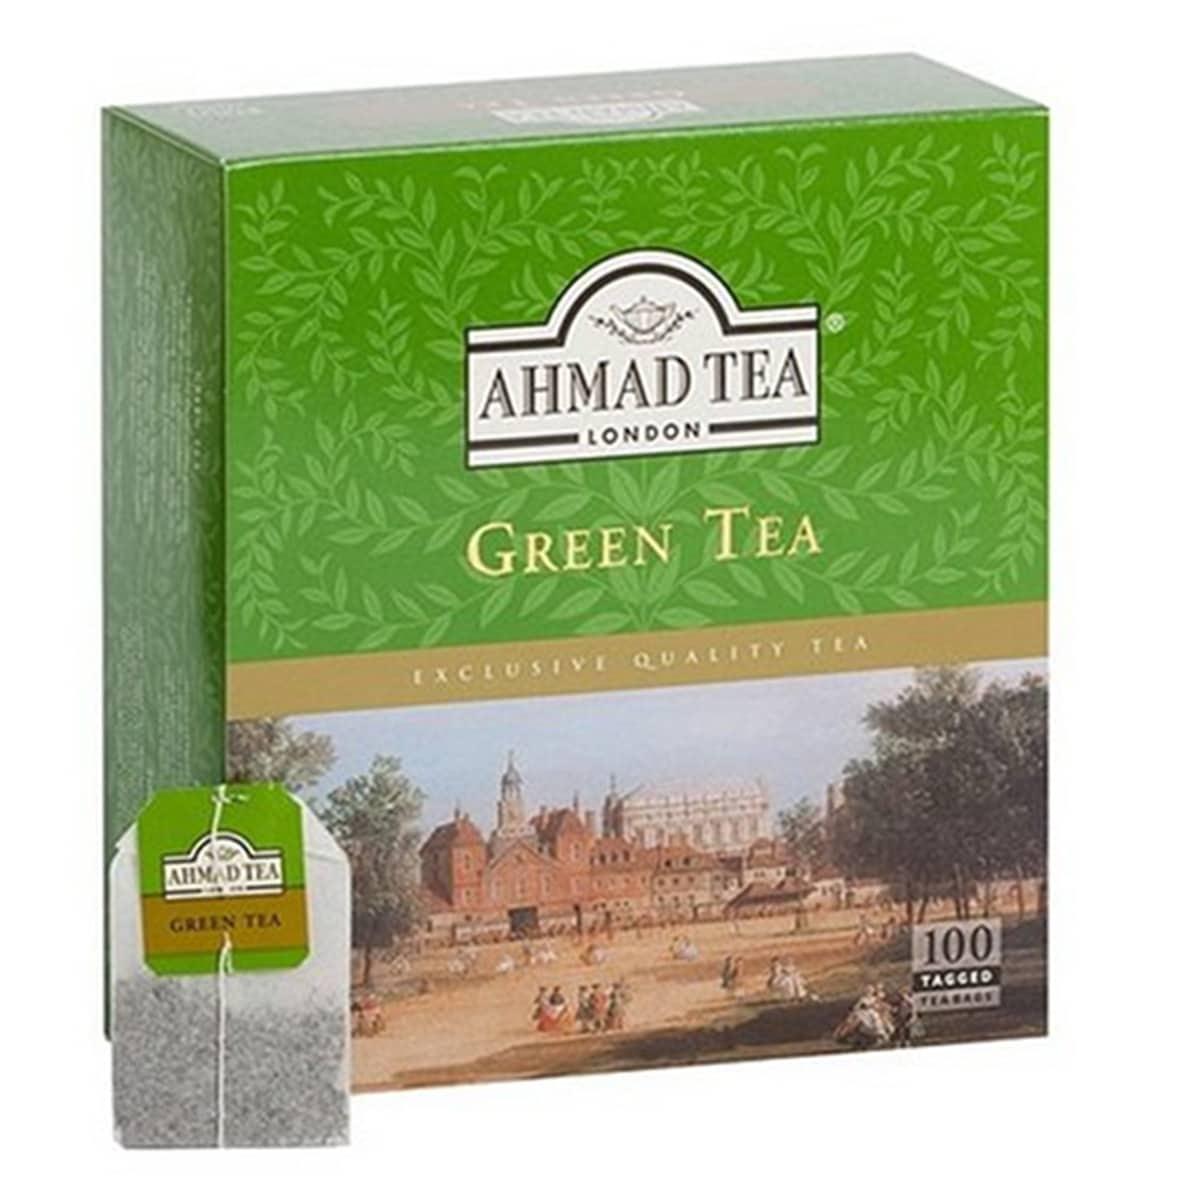 Buy Ahmad Tea London Green Tea (100 Tagged Teabags) - 500 gm